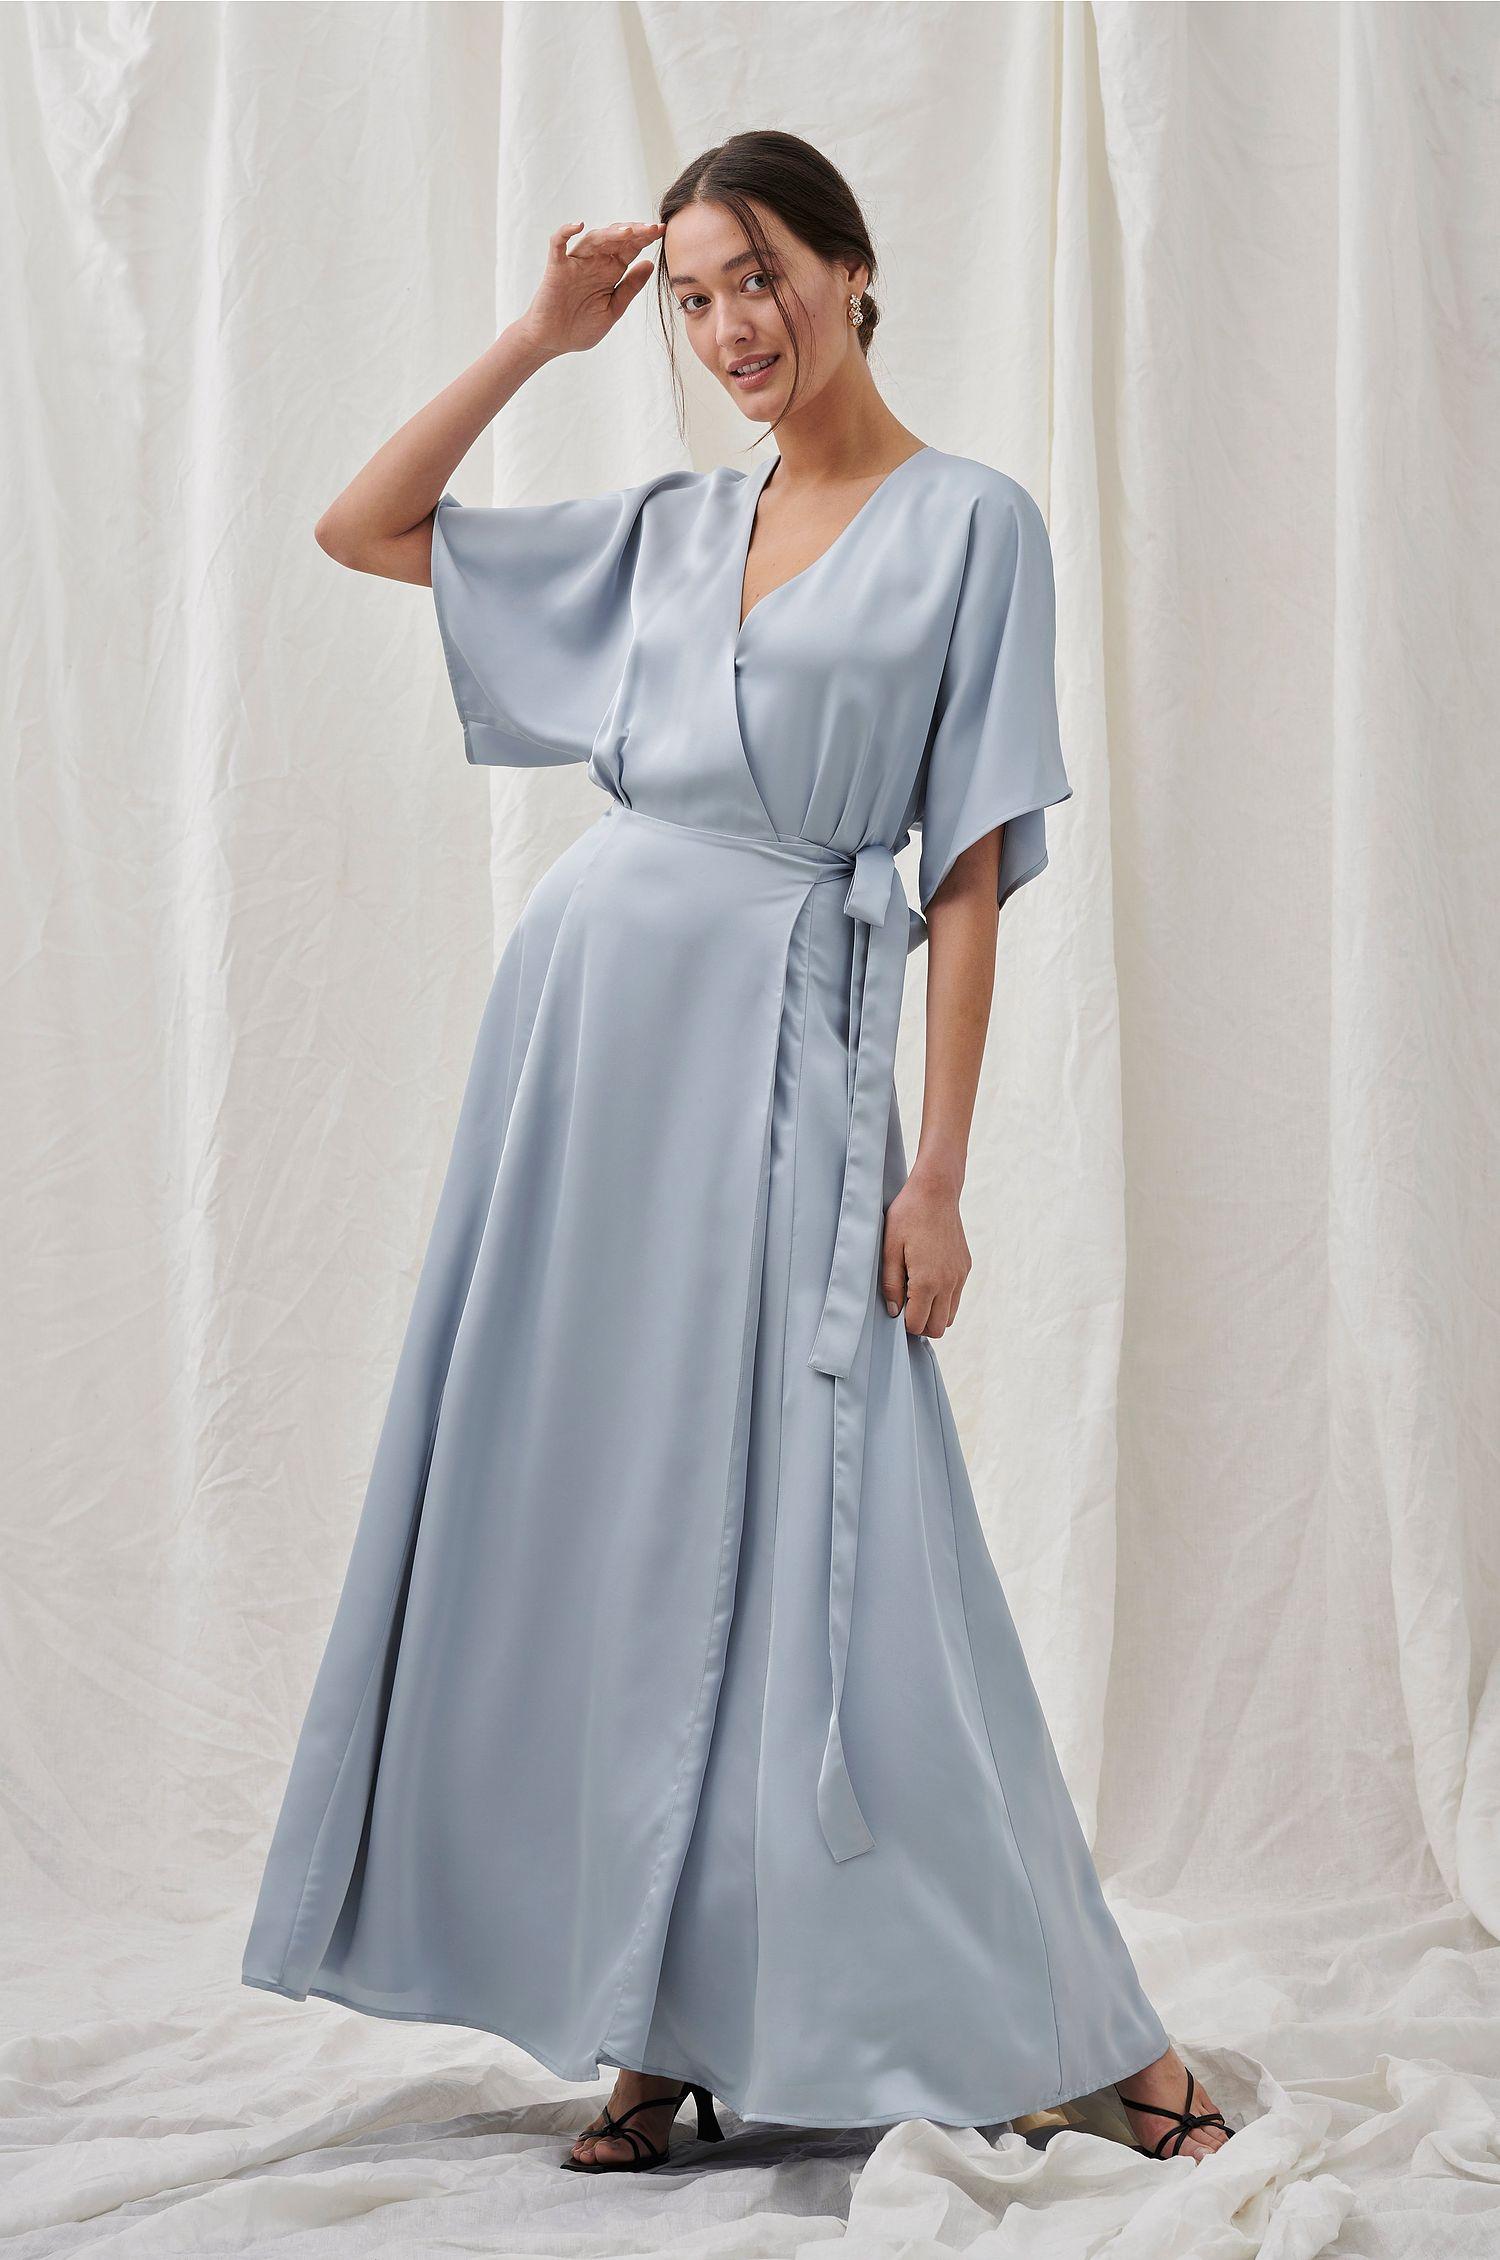 Wrap-kjole i babyblått